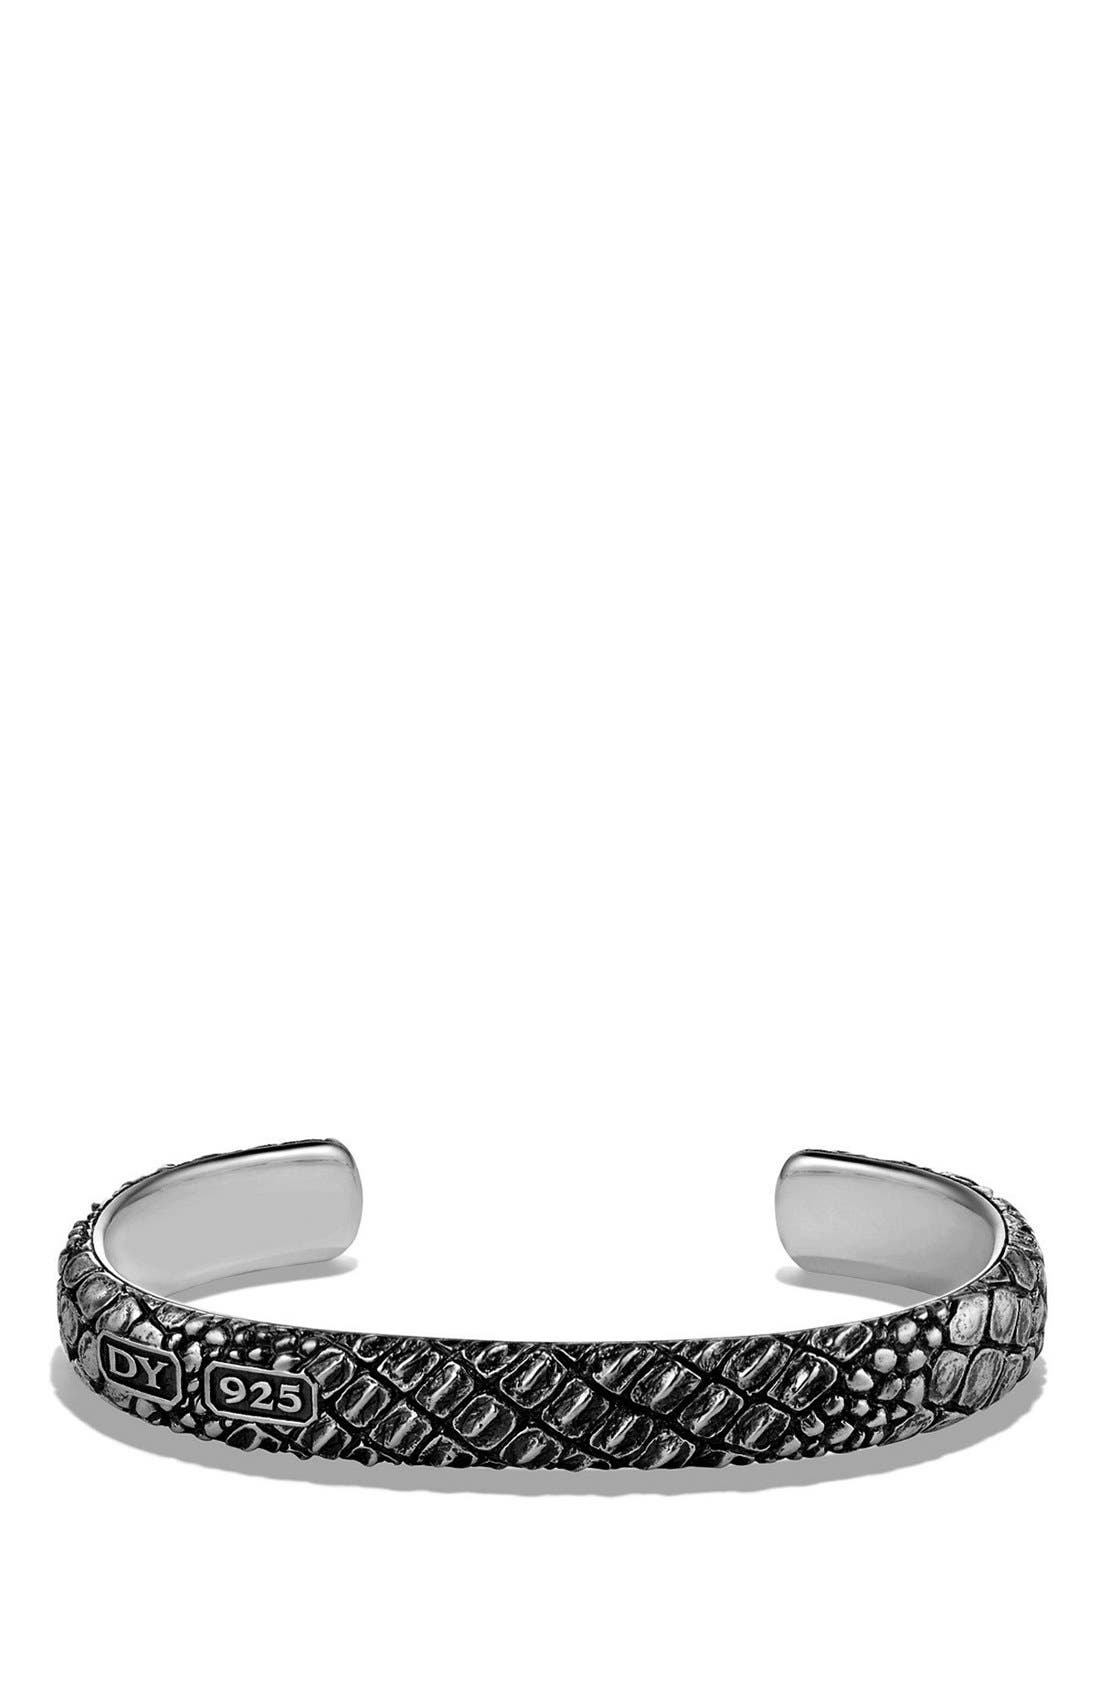 Main Image - David Yurman 'Naturals' Gator Cuff Bracelet